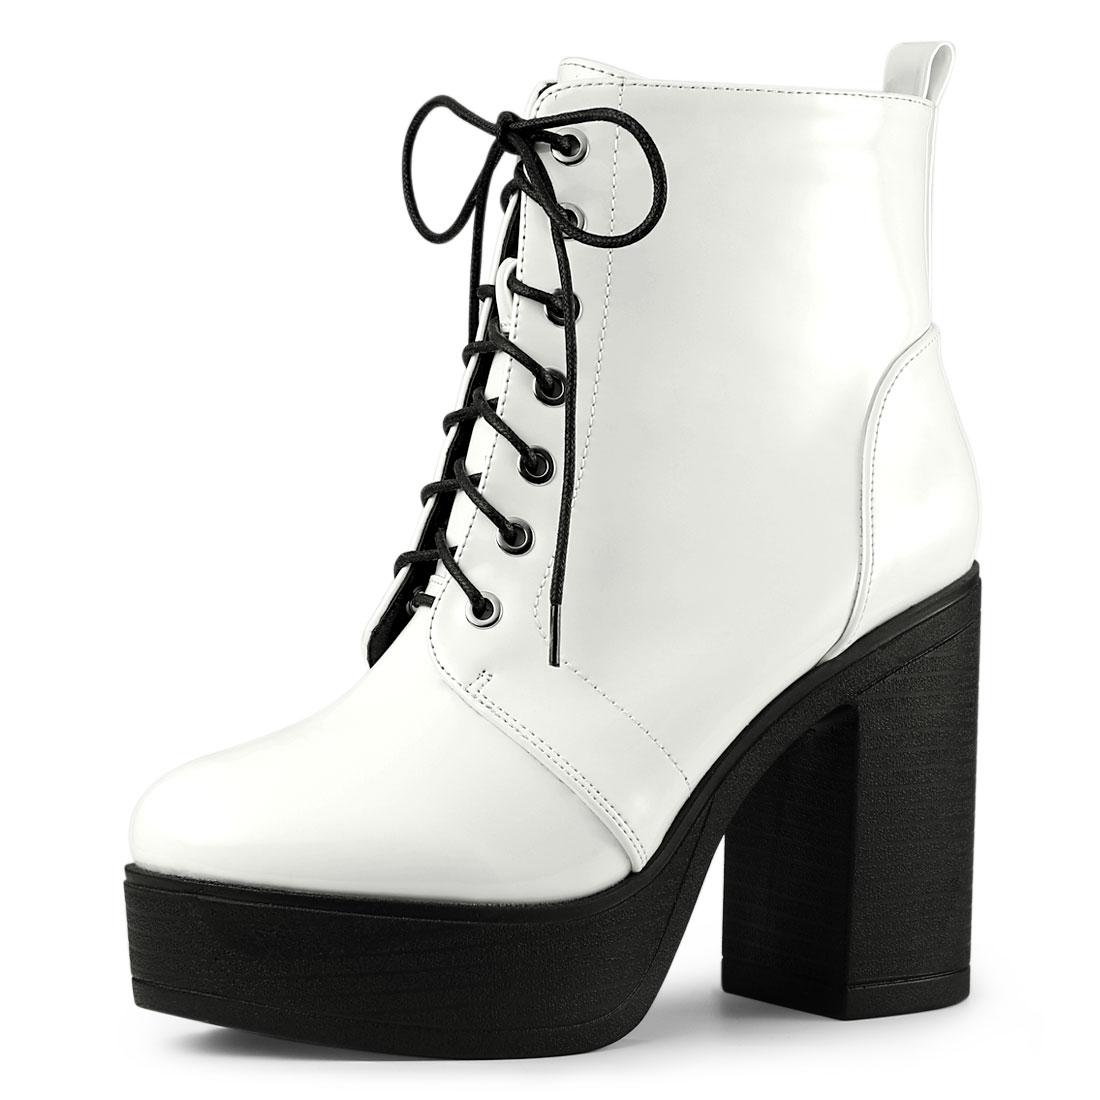 Allegra K Women's Platform Chunky High Heel Lace Up Combat Boots White US 7.5